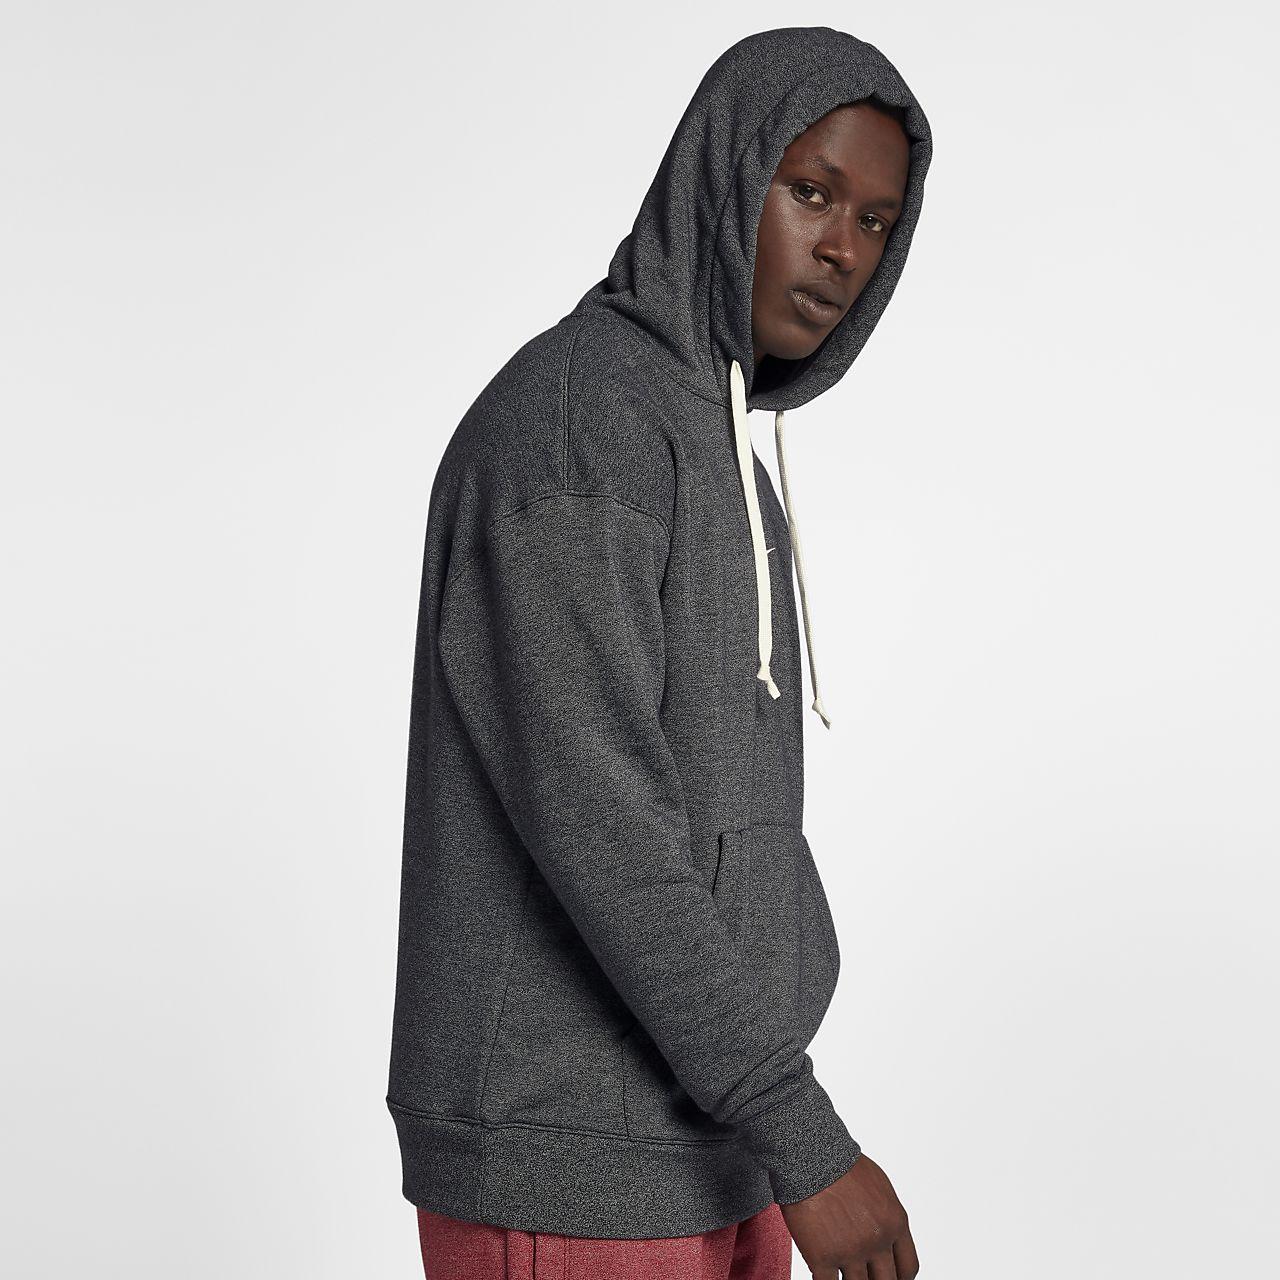 Sportswear Pour À Sweat Nike Heritage Capuche Homme 6gYfv7ybIm